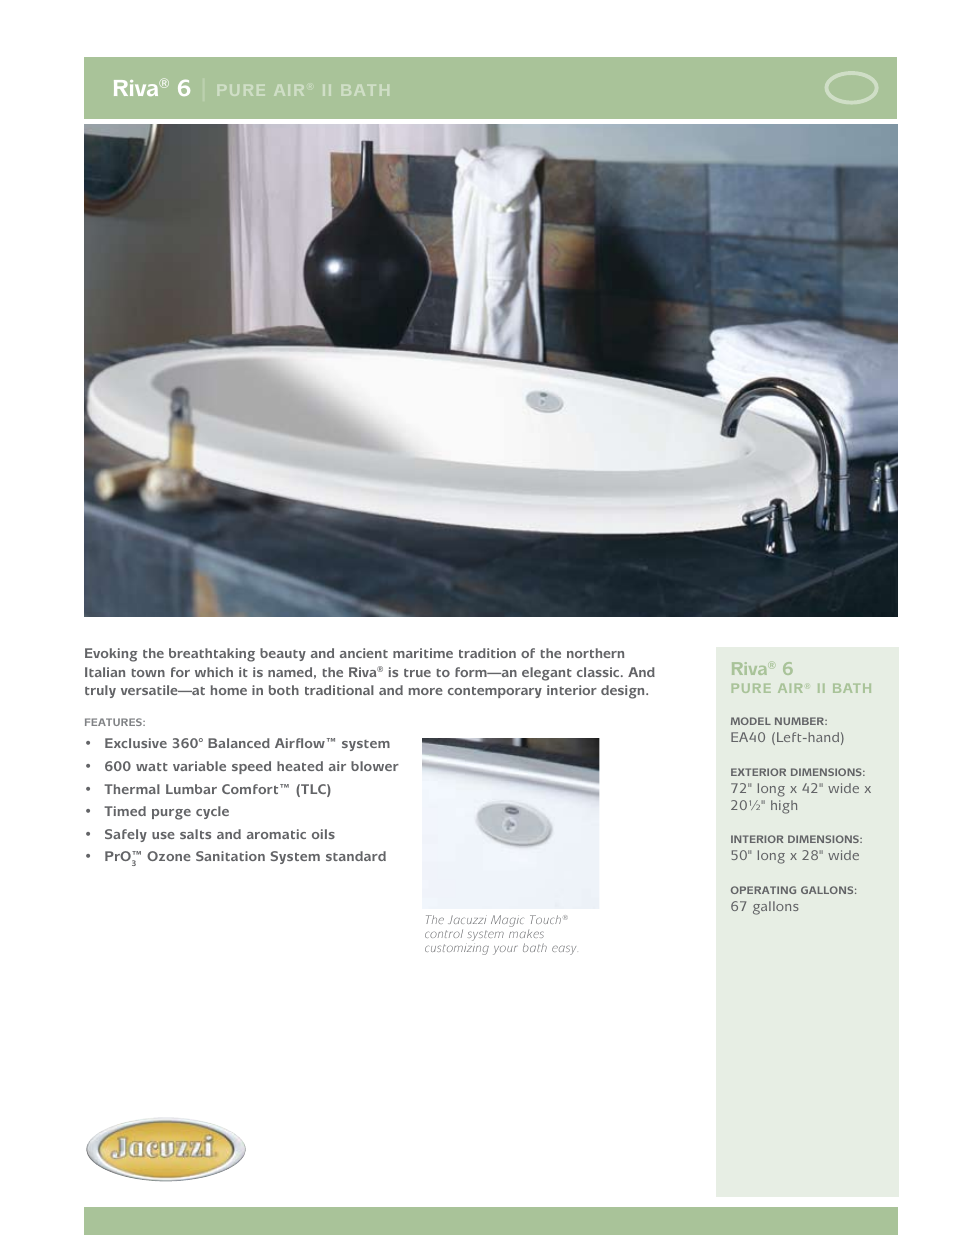 Jacuzzi Riva 6 Pure Air II Bath EA40 User Manual | 2 pages